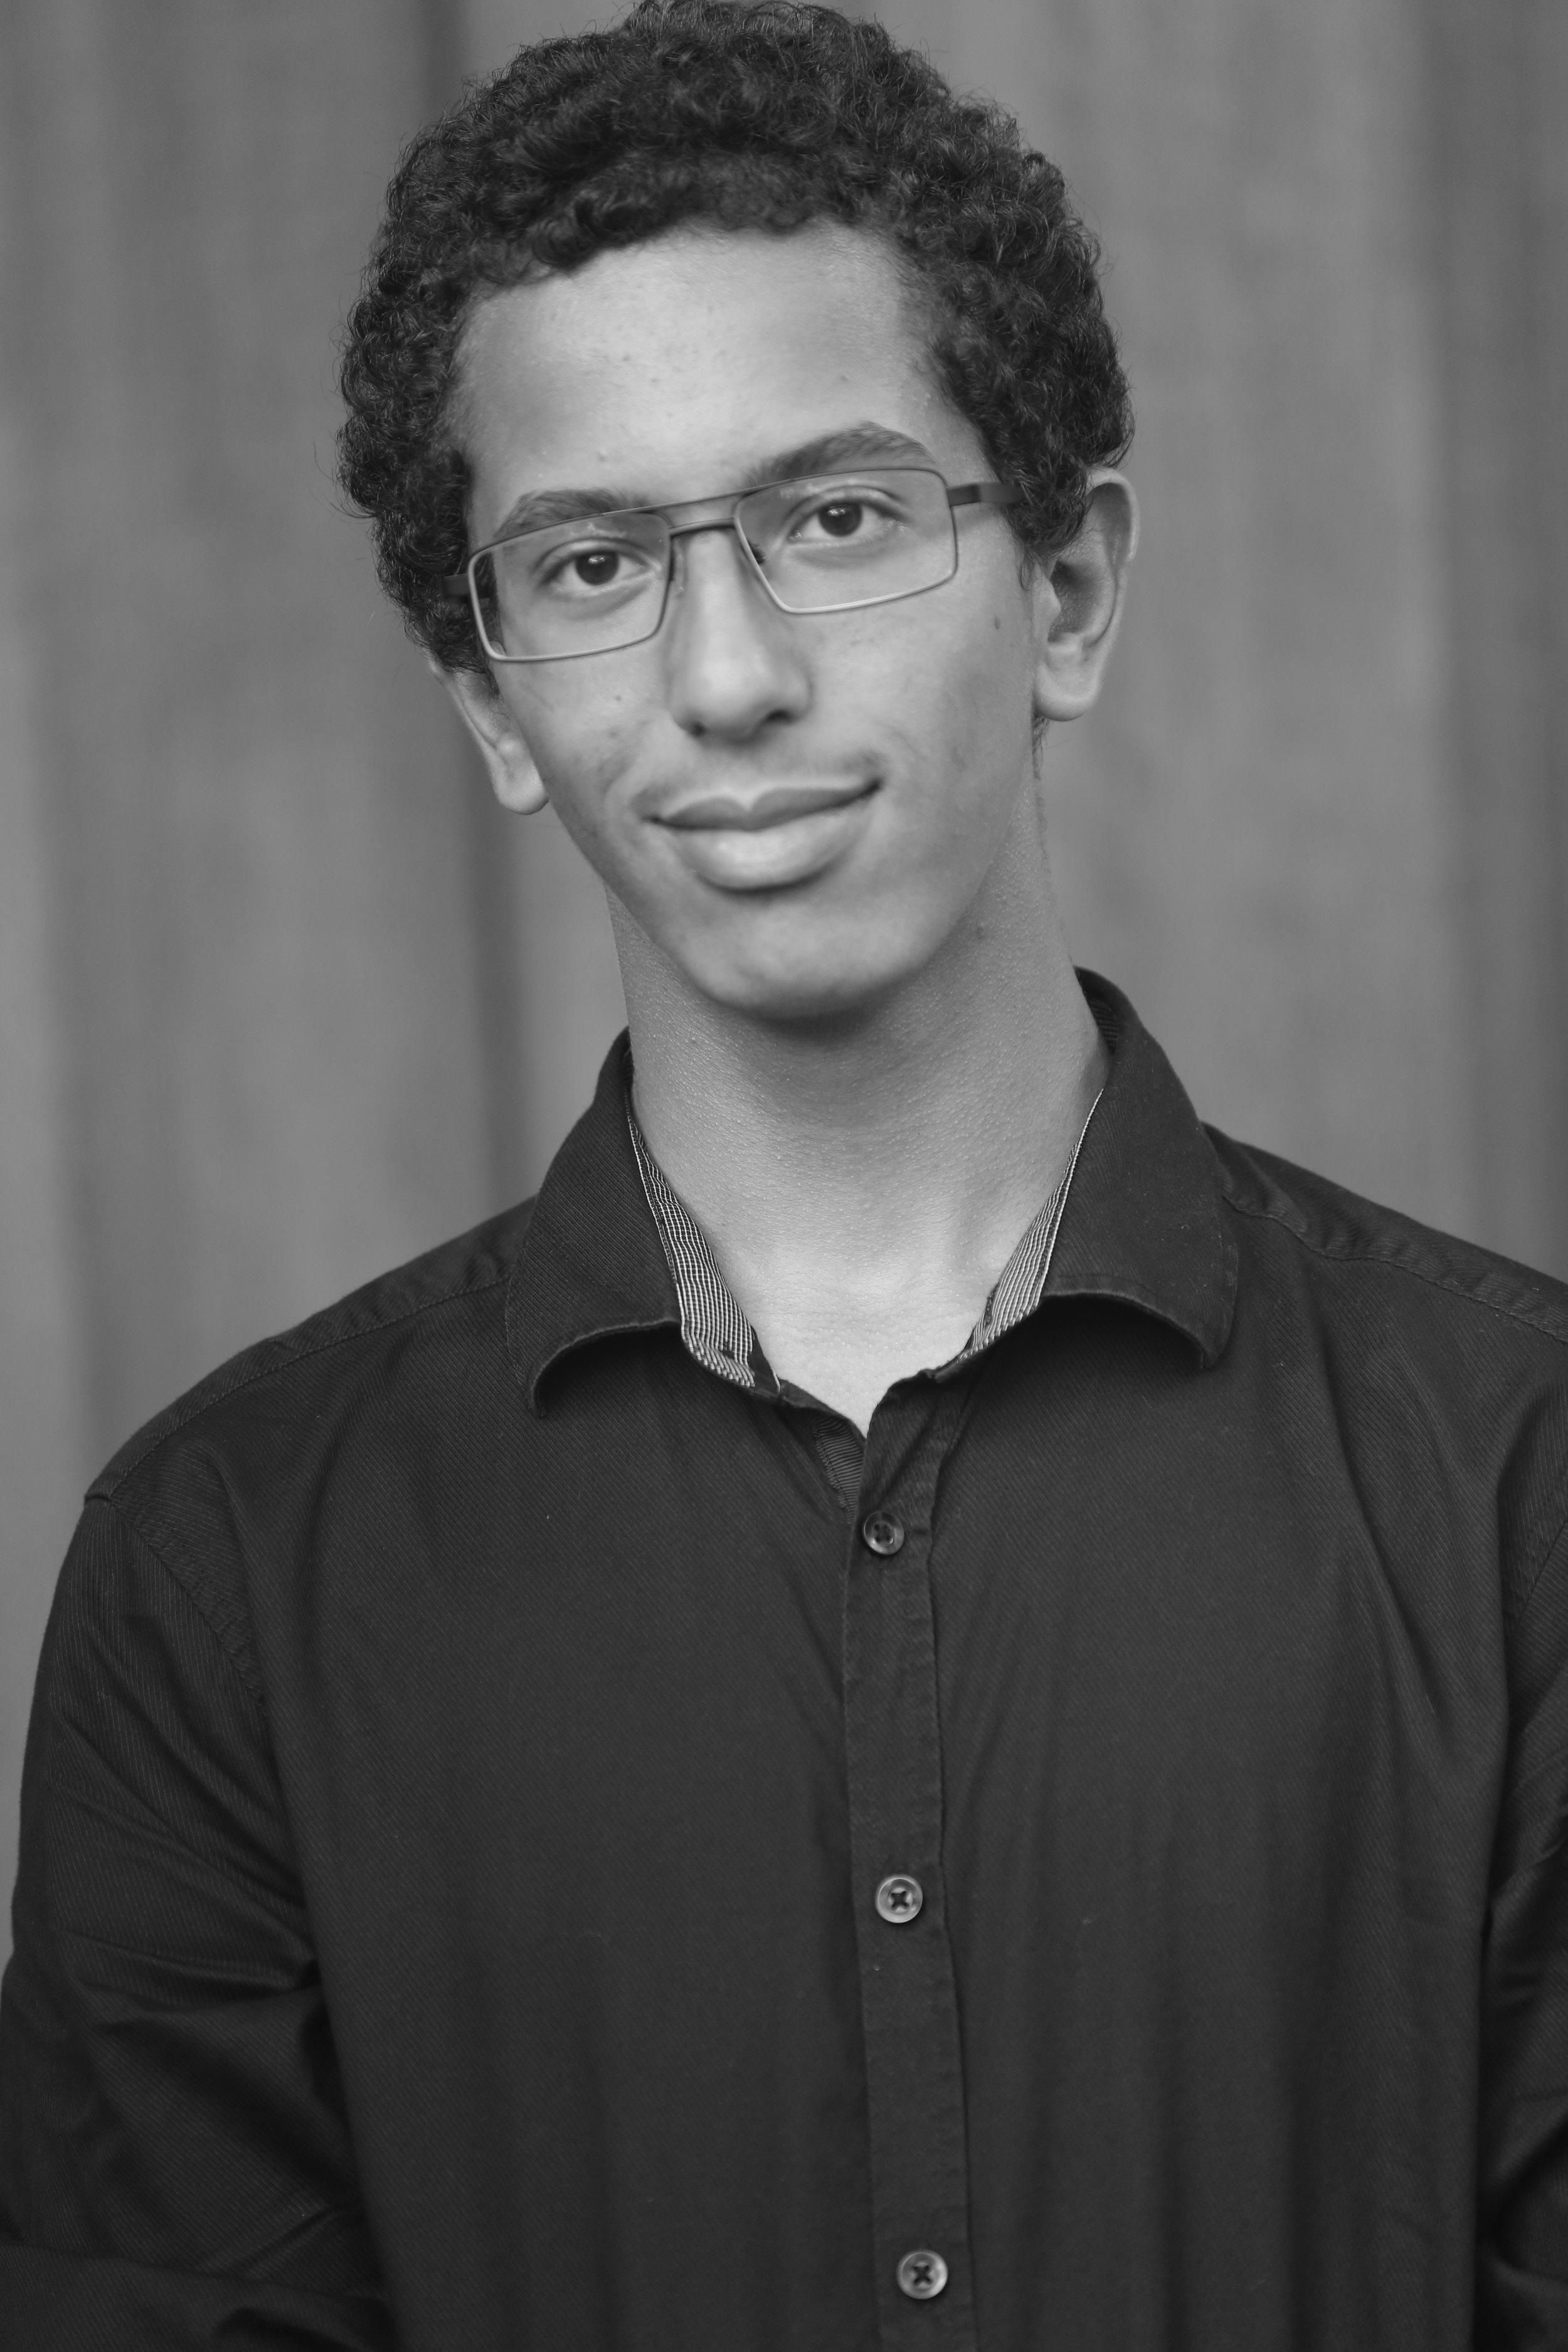 Youssef Abdelhamid